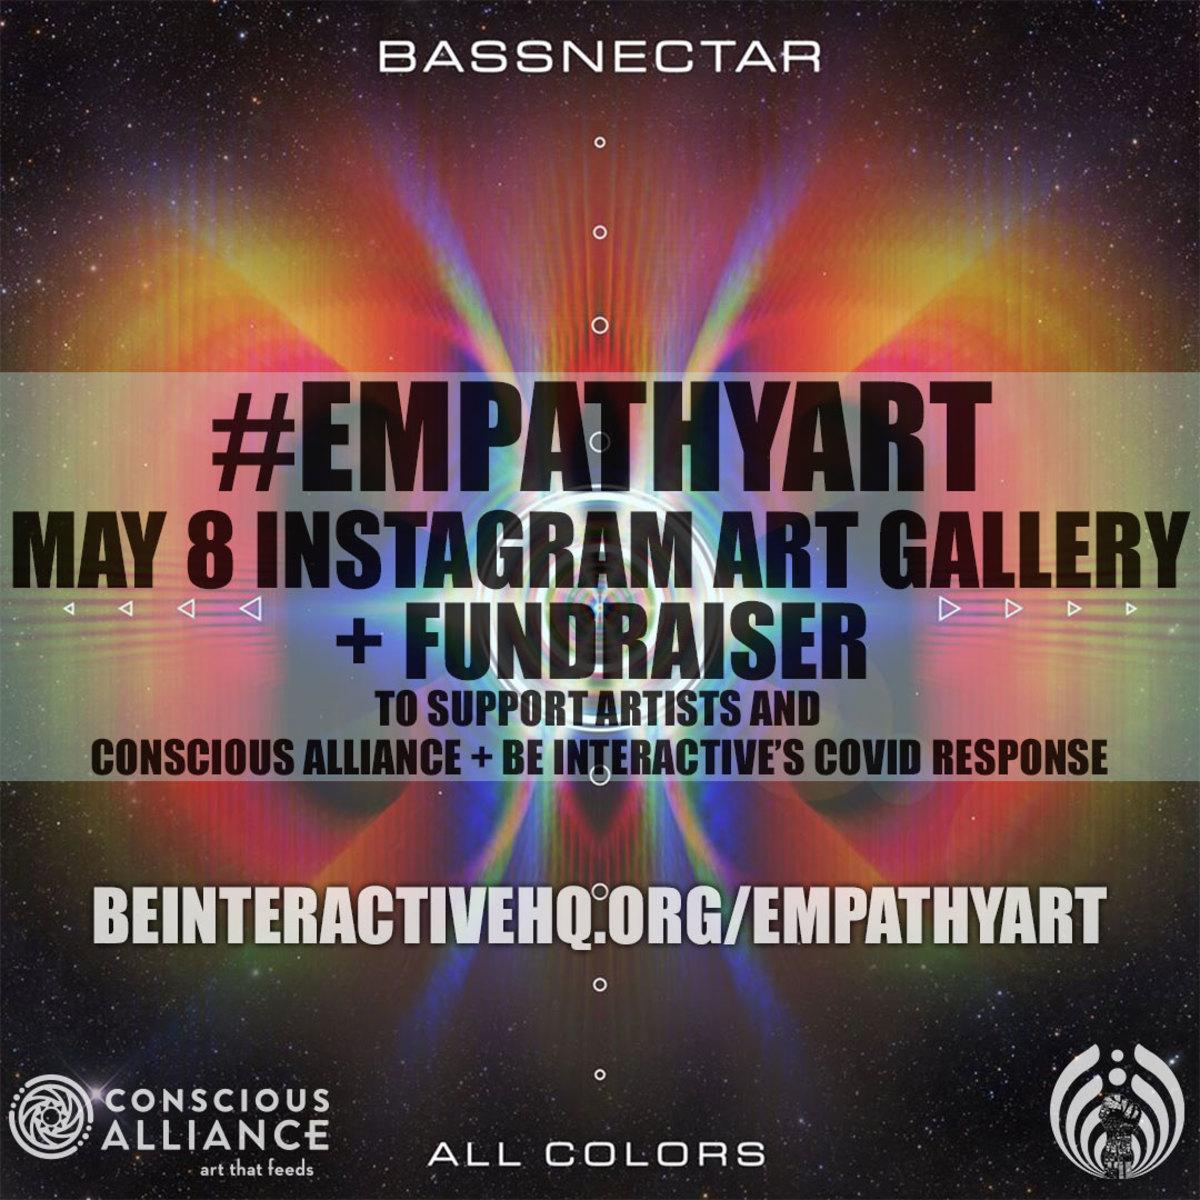 empathyart